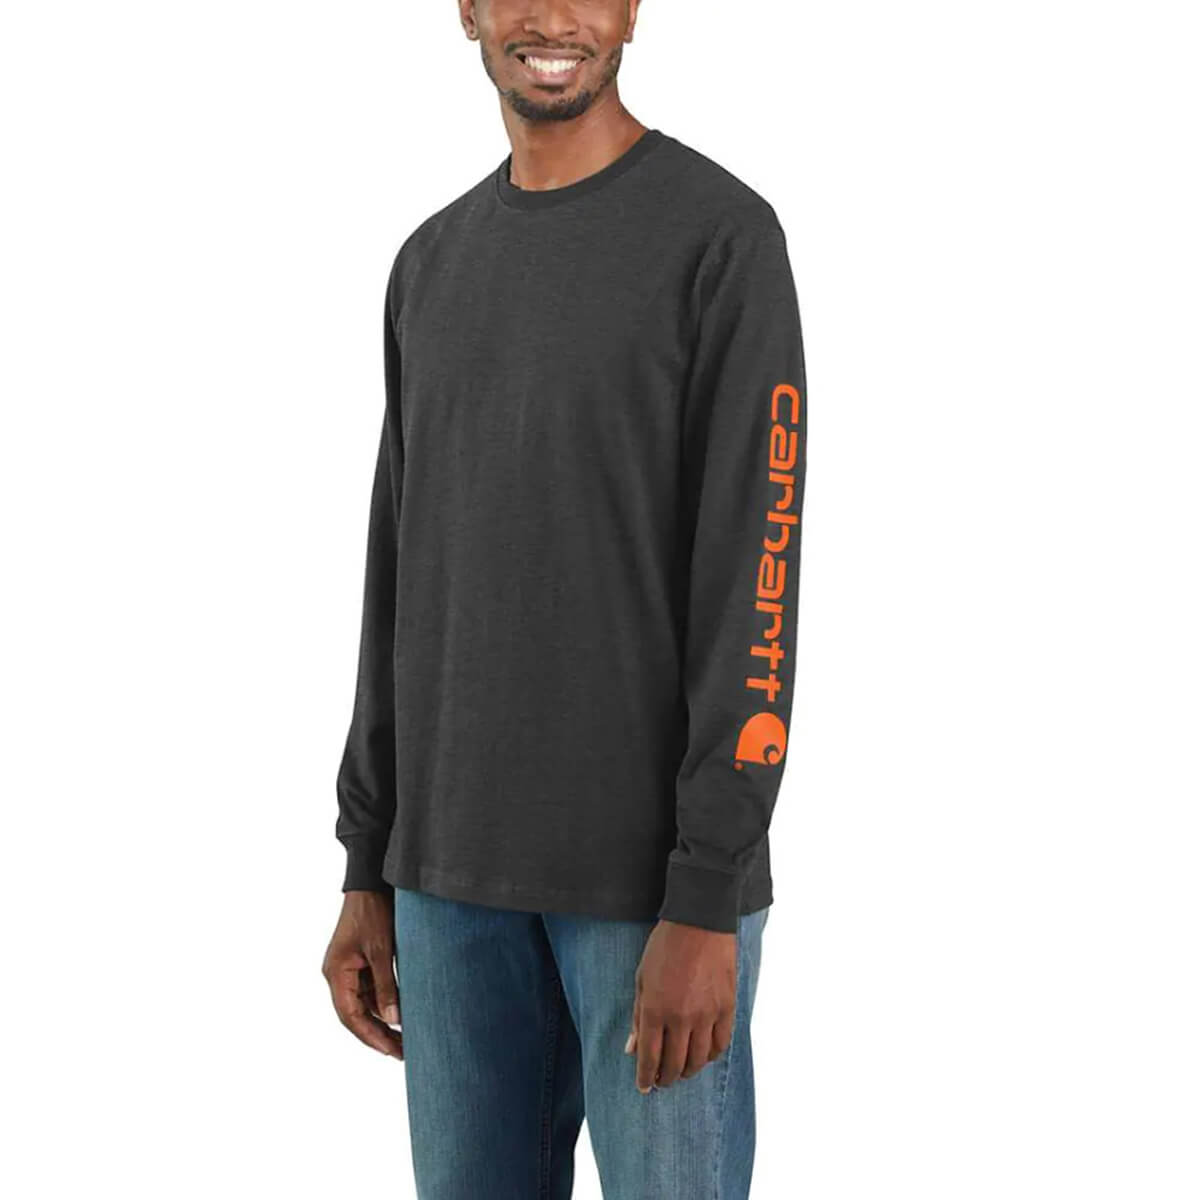 Carhartt Long-Sleeve Graphic Logo - Dark Grey